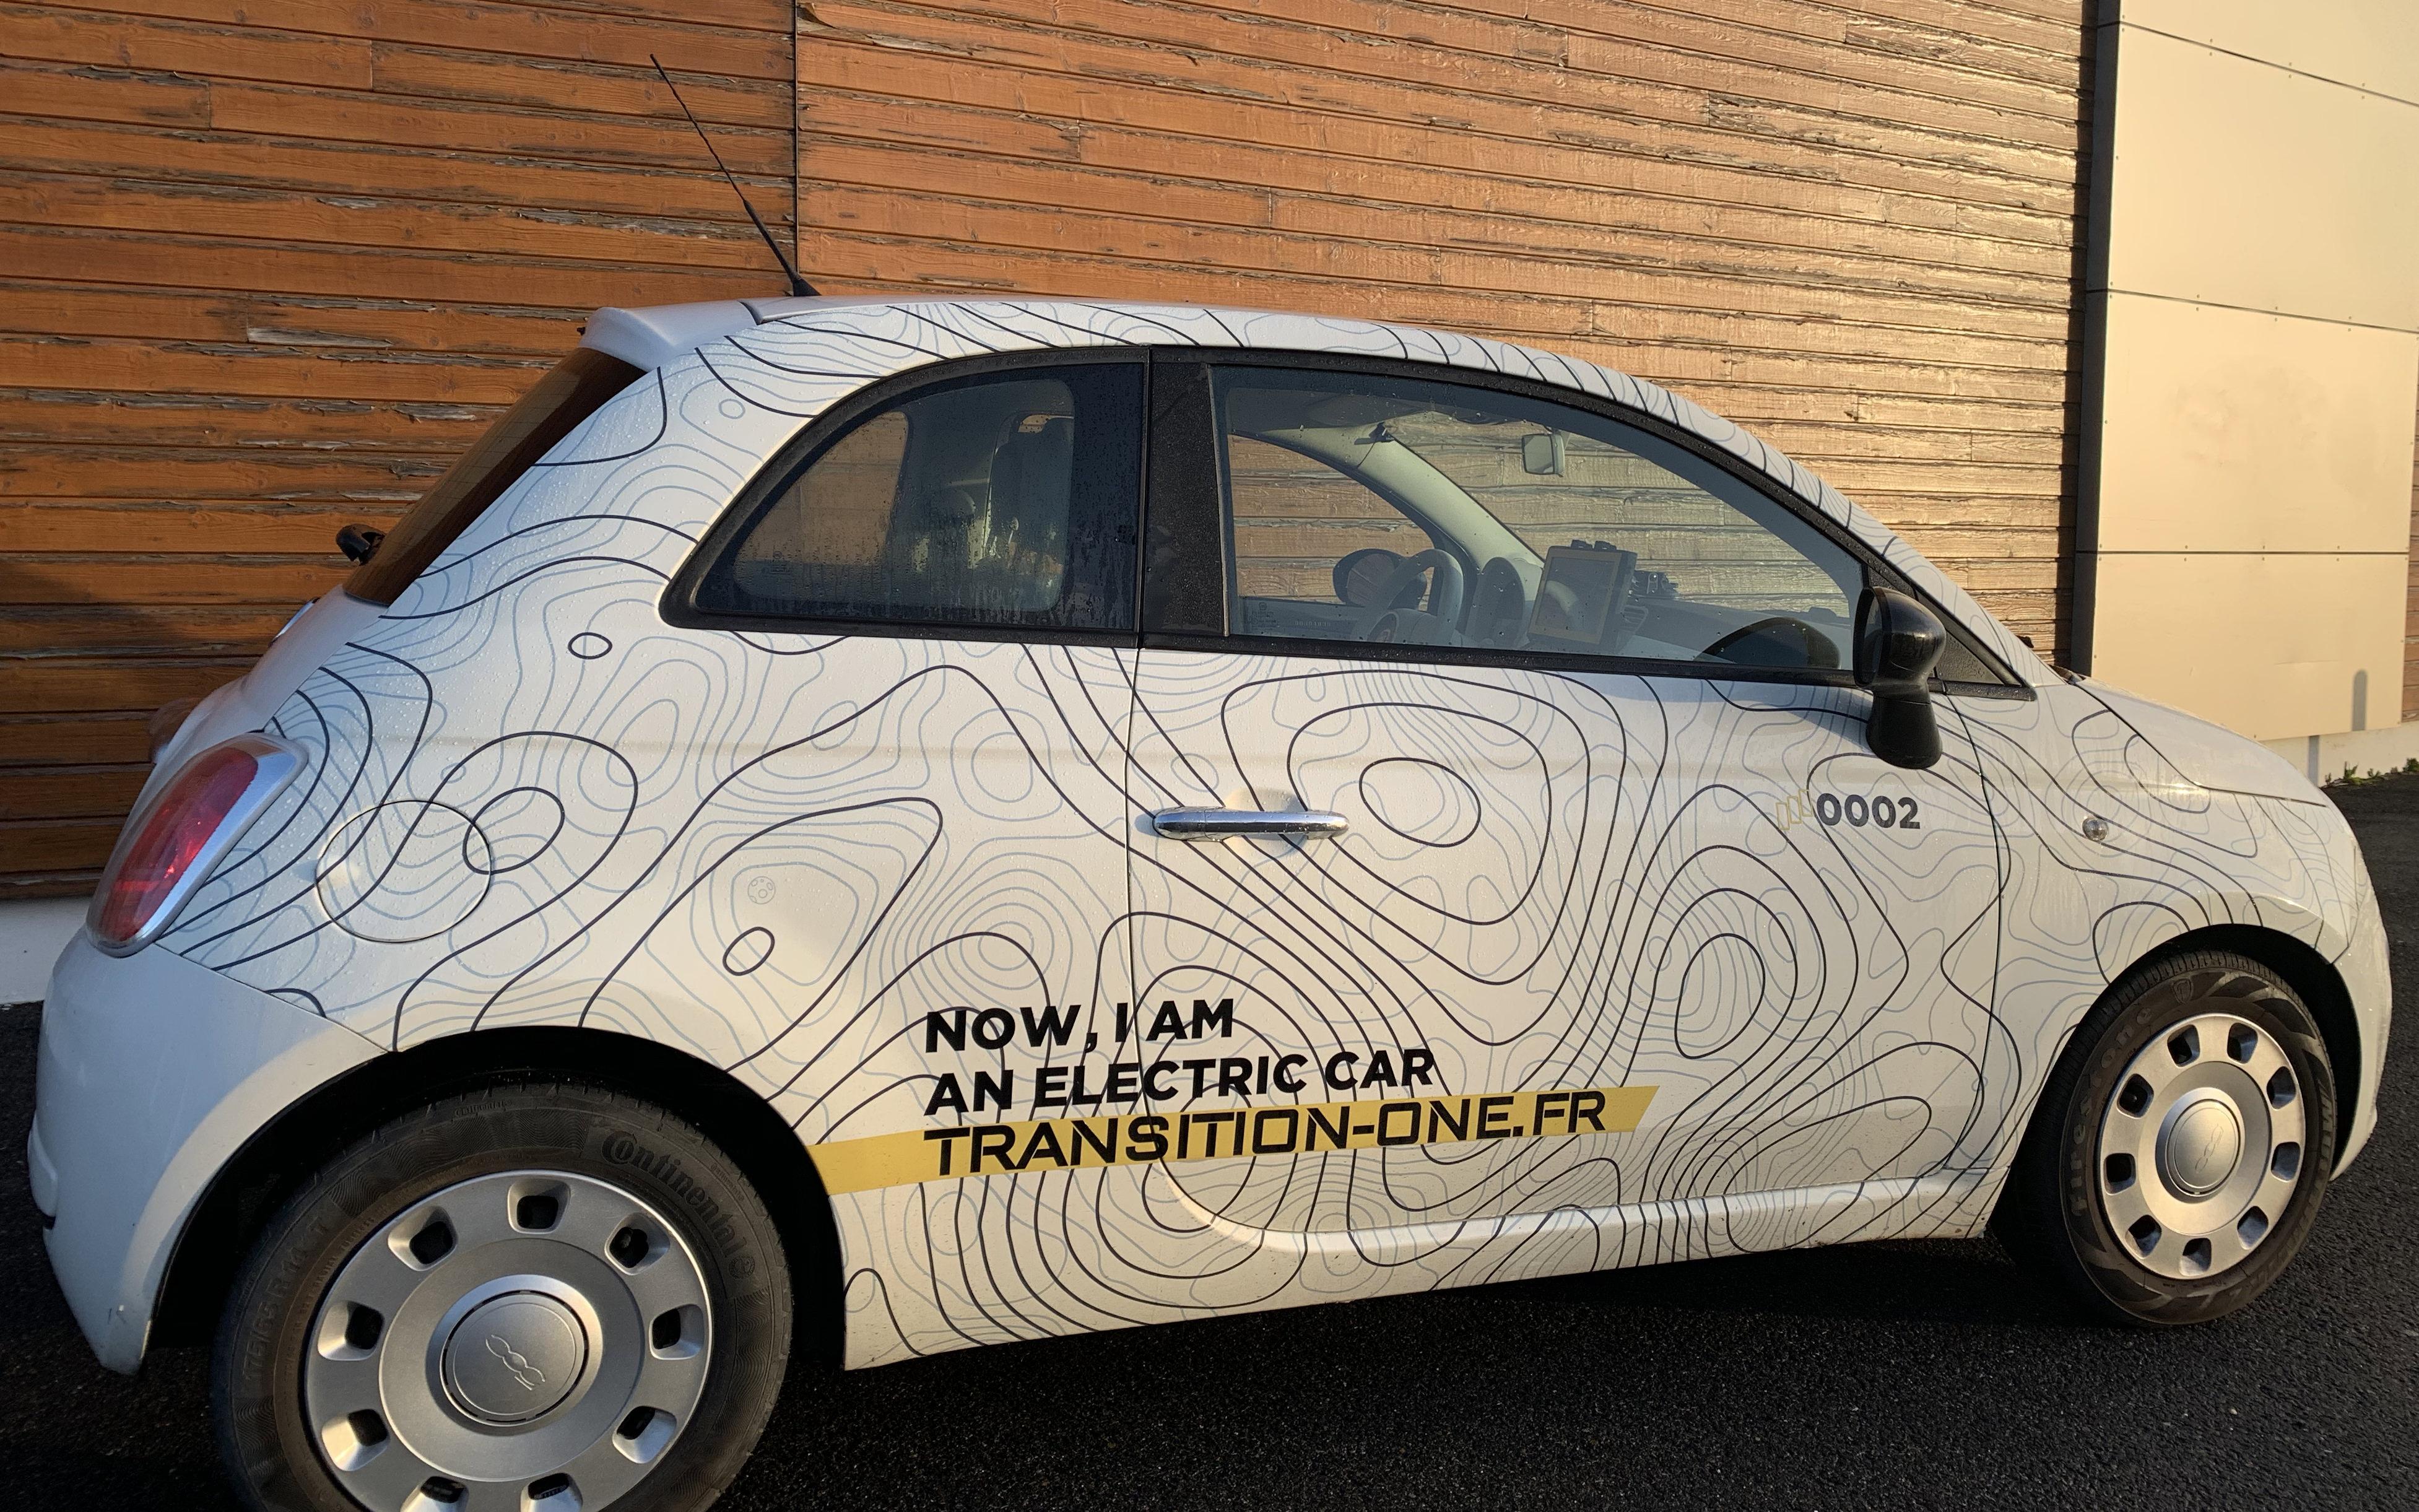 Gallery Transition-One Car Retrofit Technology 2